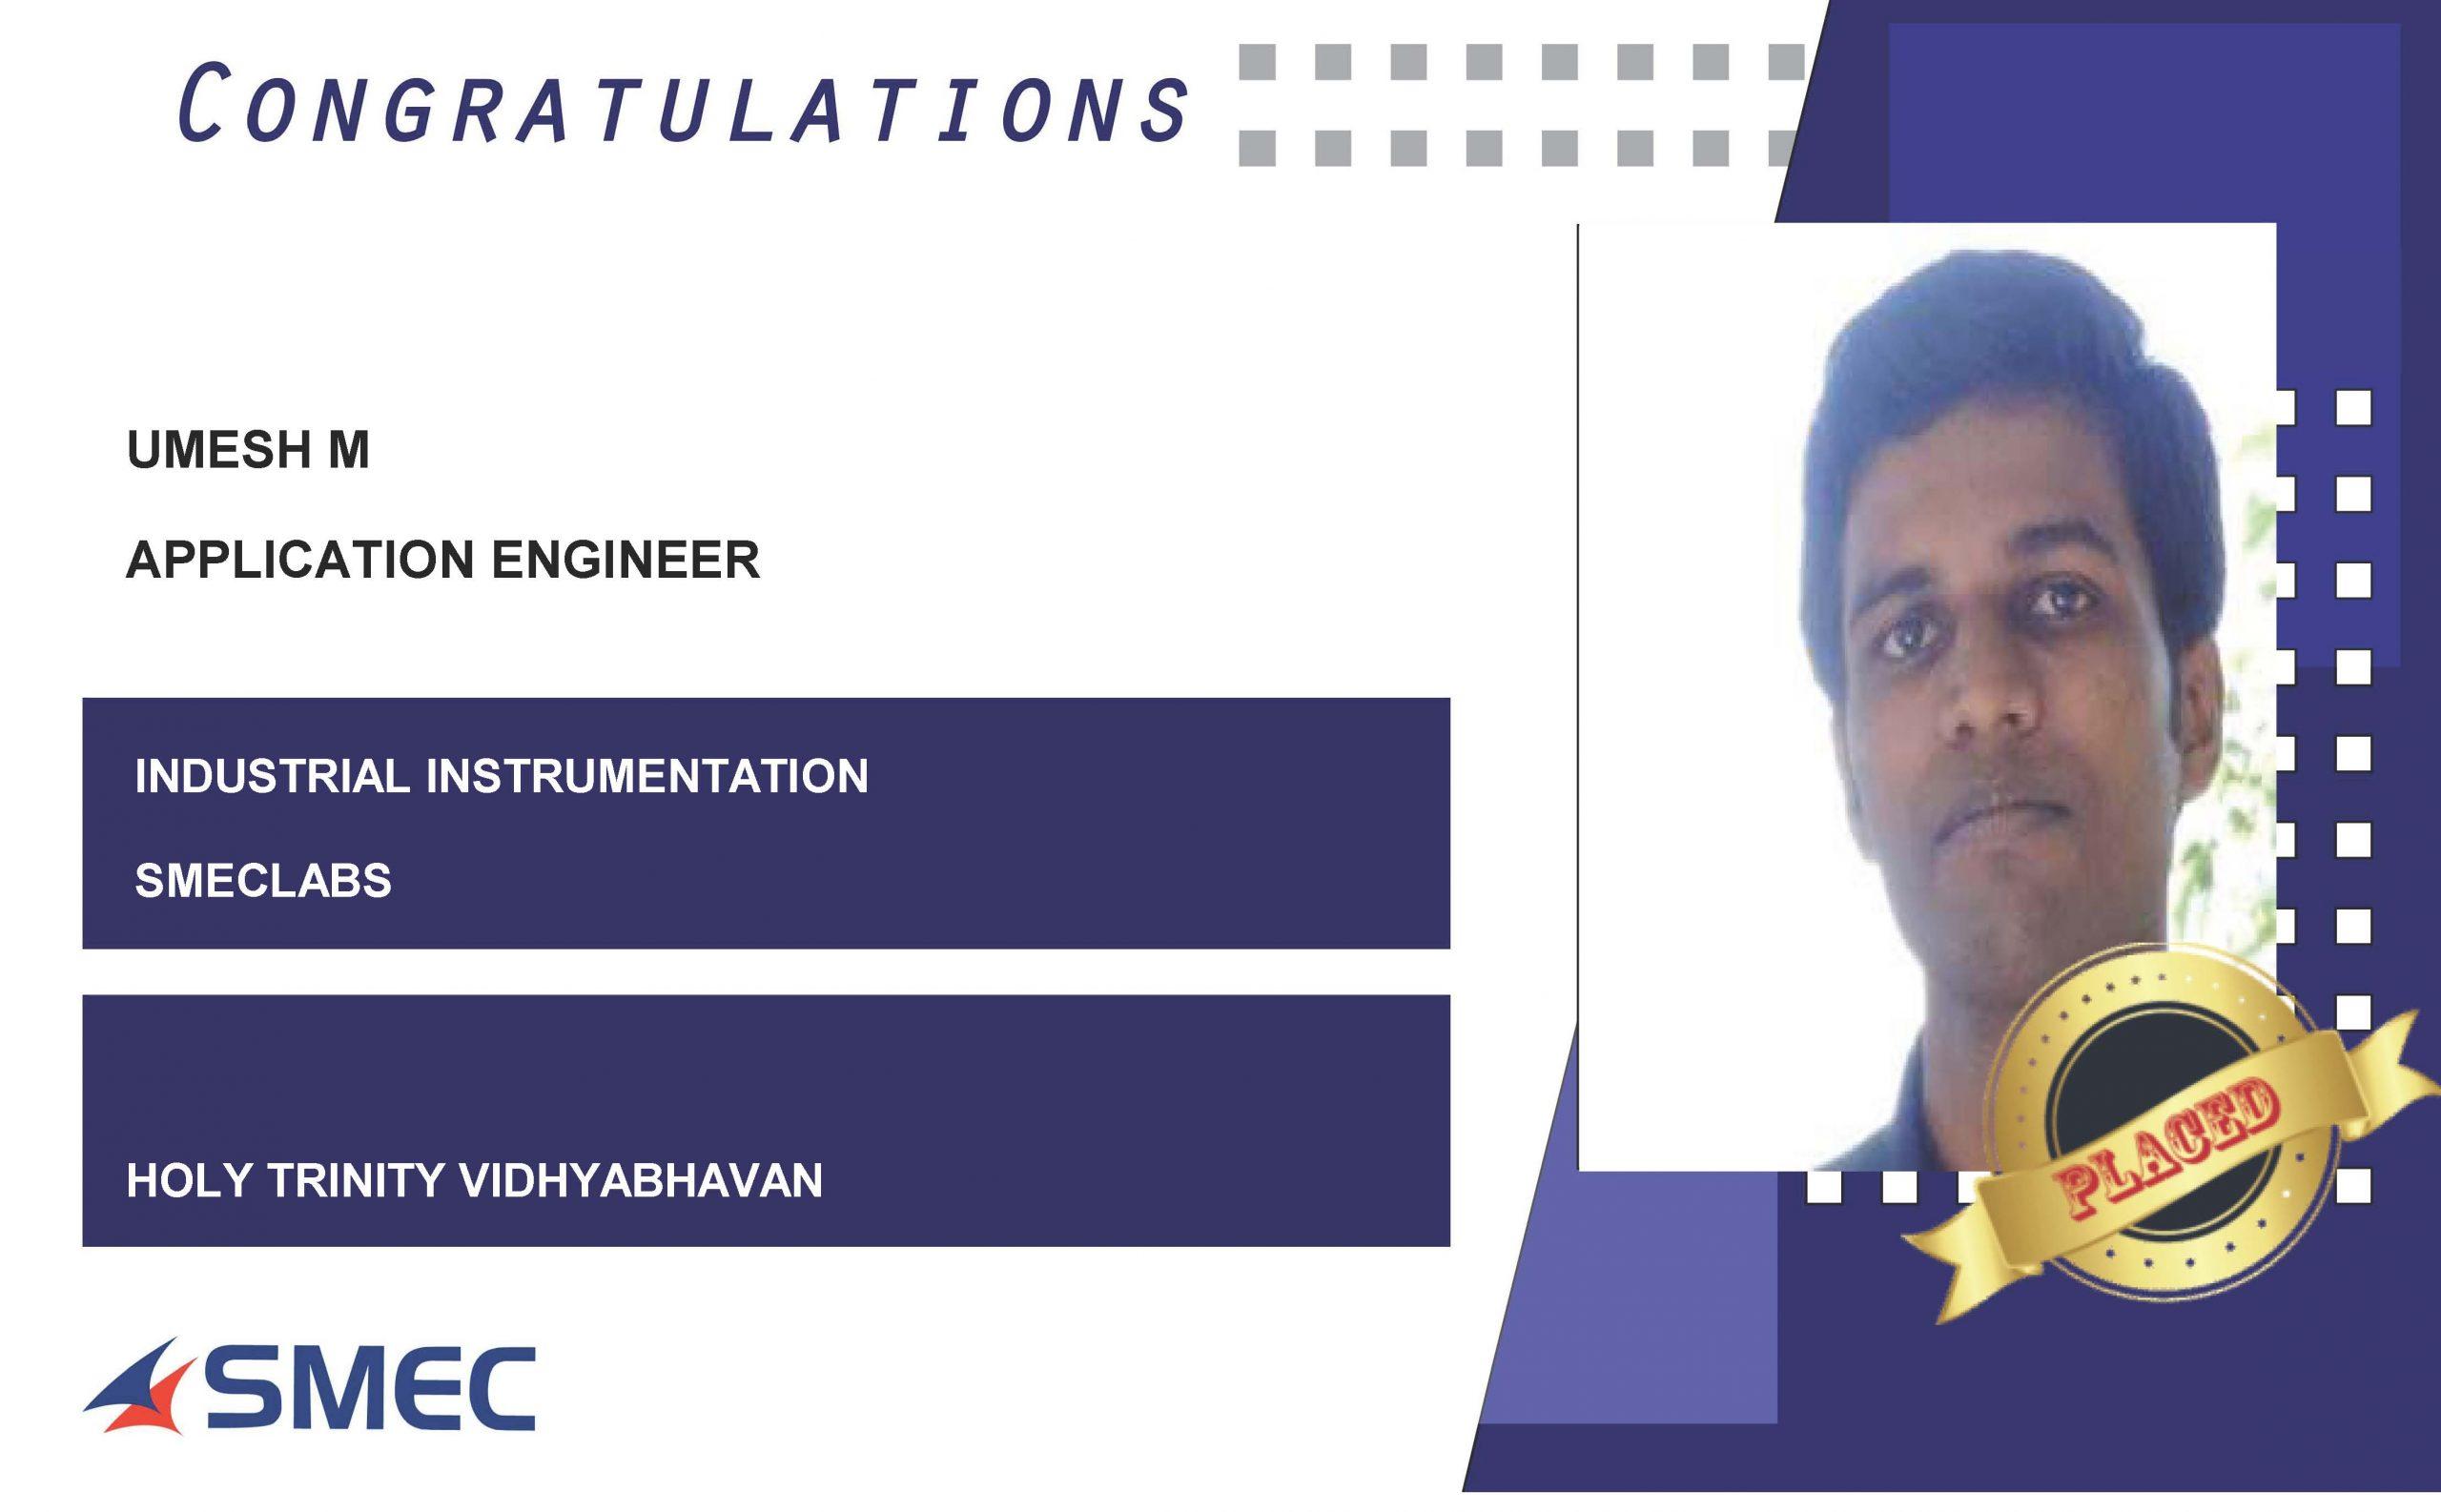 Application engineer- umesh m